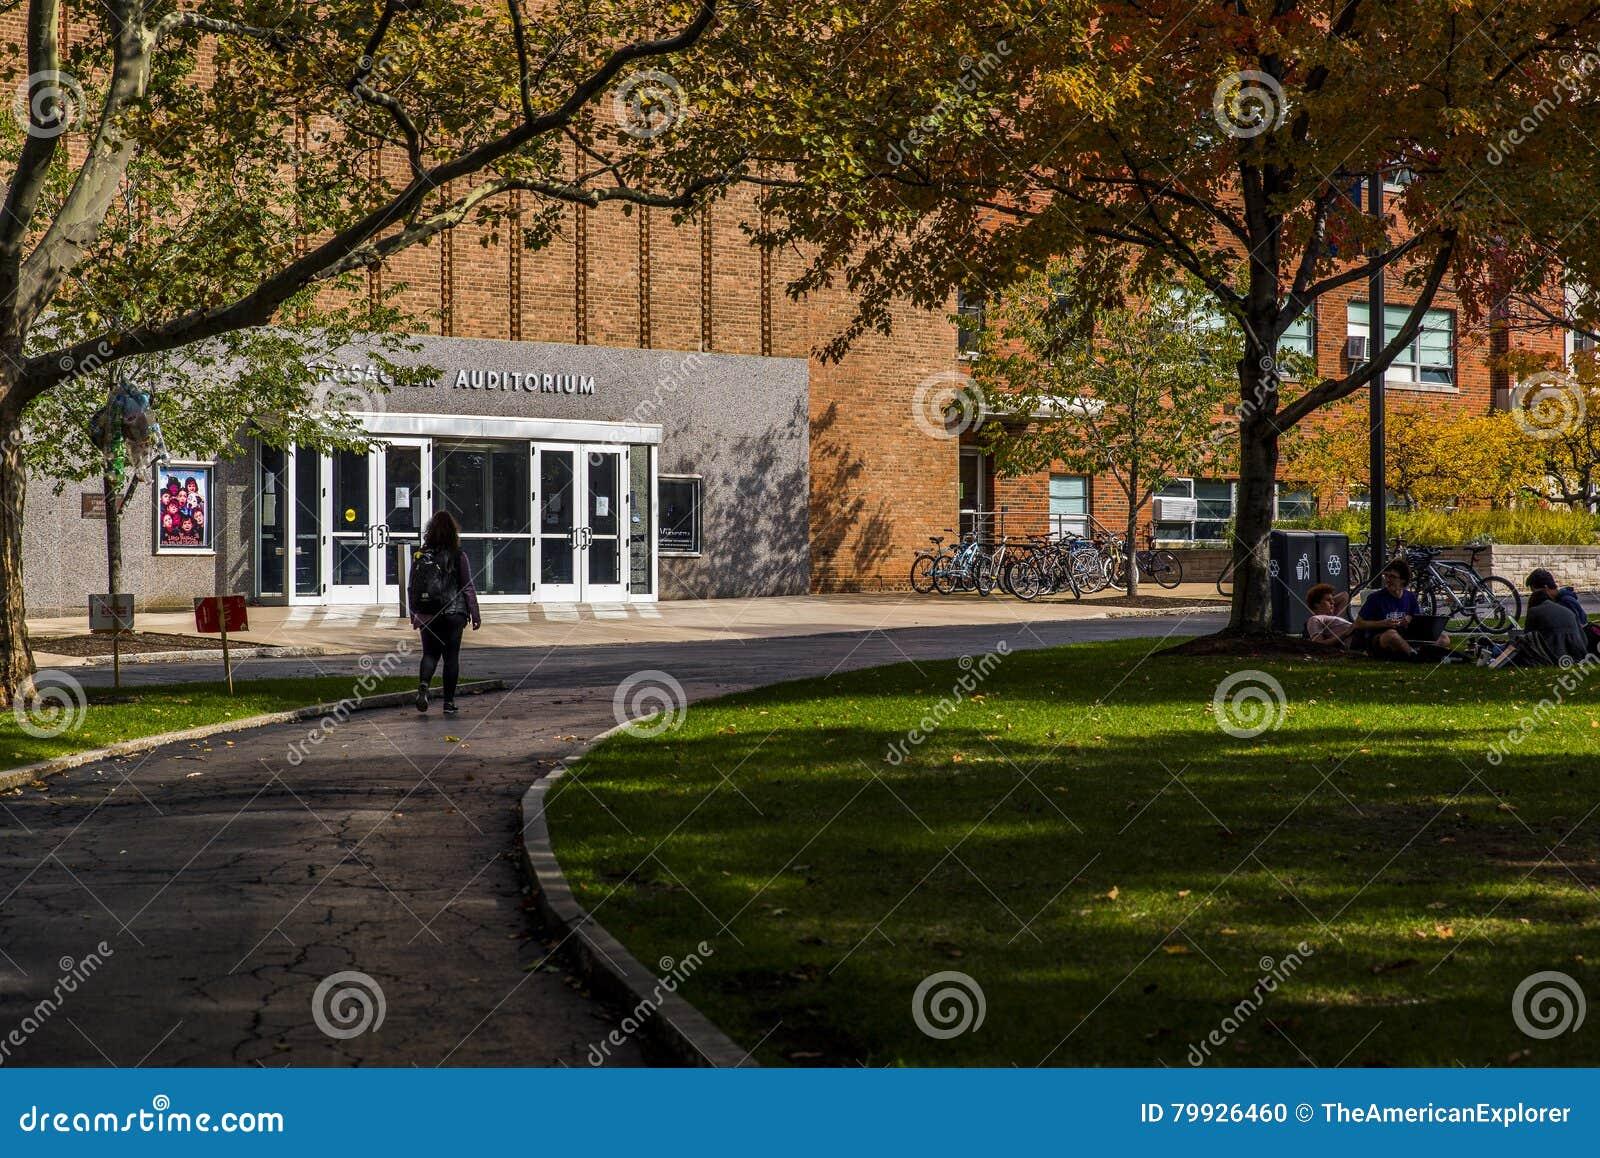 Strosacker Auditorium - Case Western Reserve University